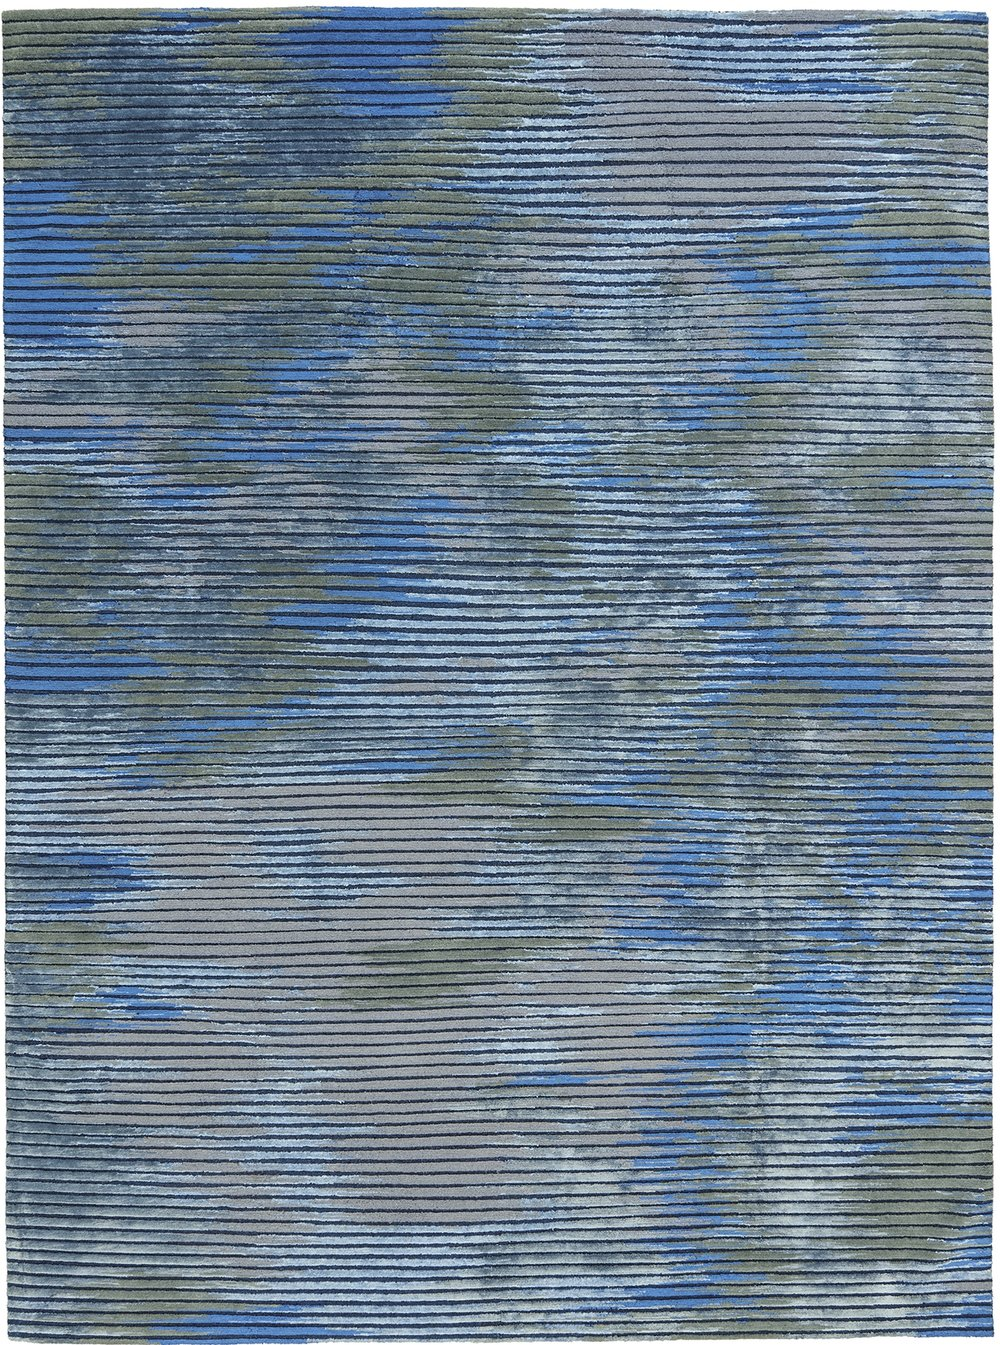 Tai ping, hk scenematic by andre 25cc 2581 fu rhythmic shadow